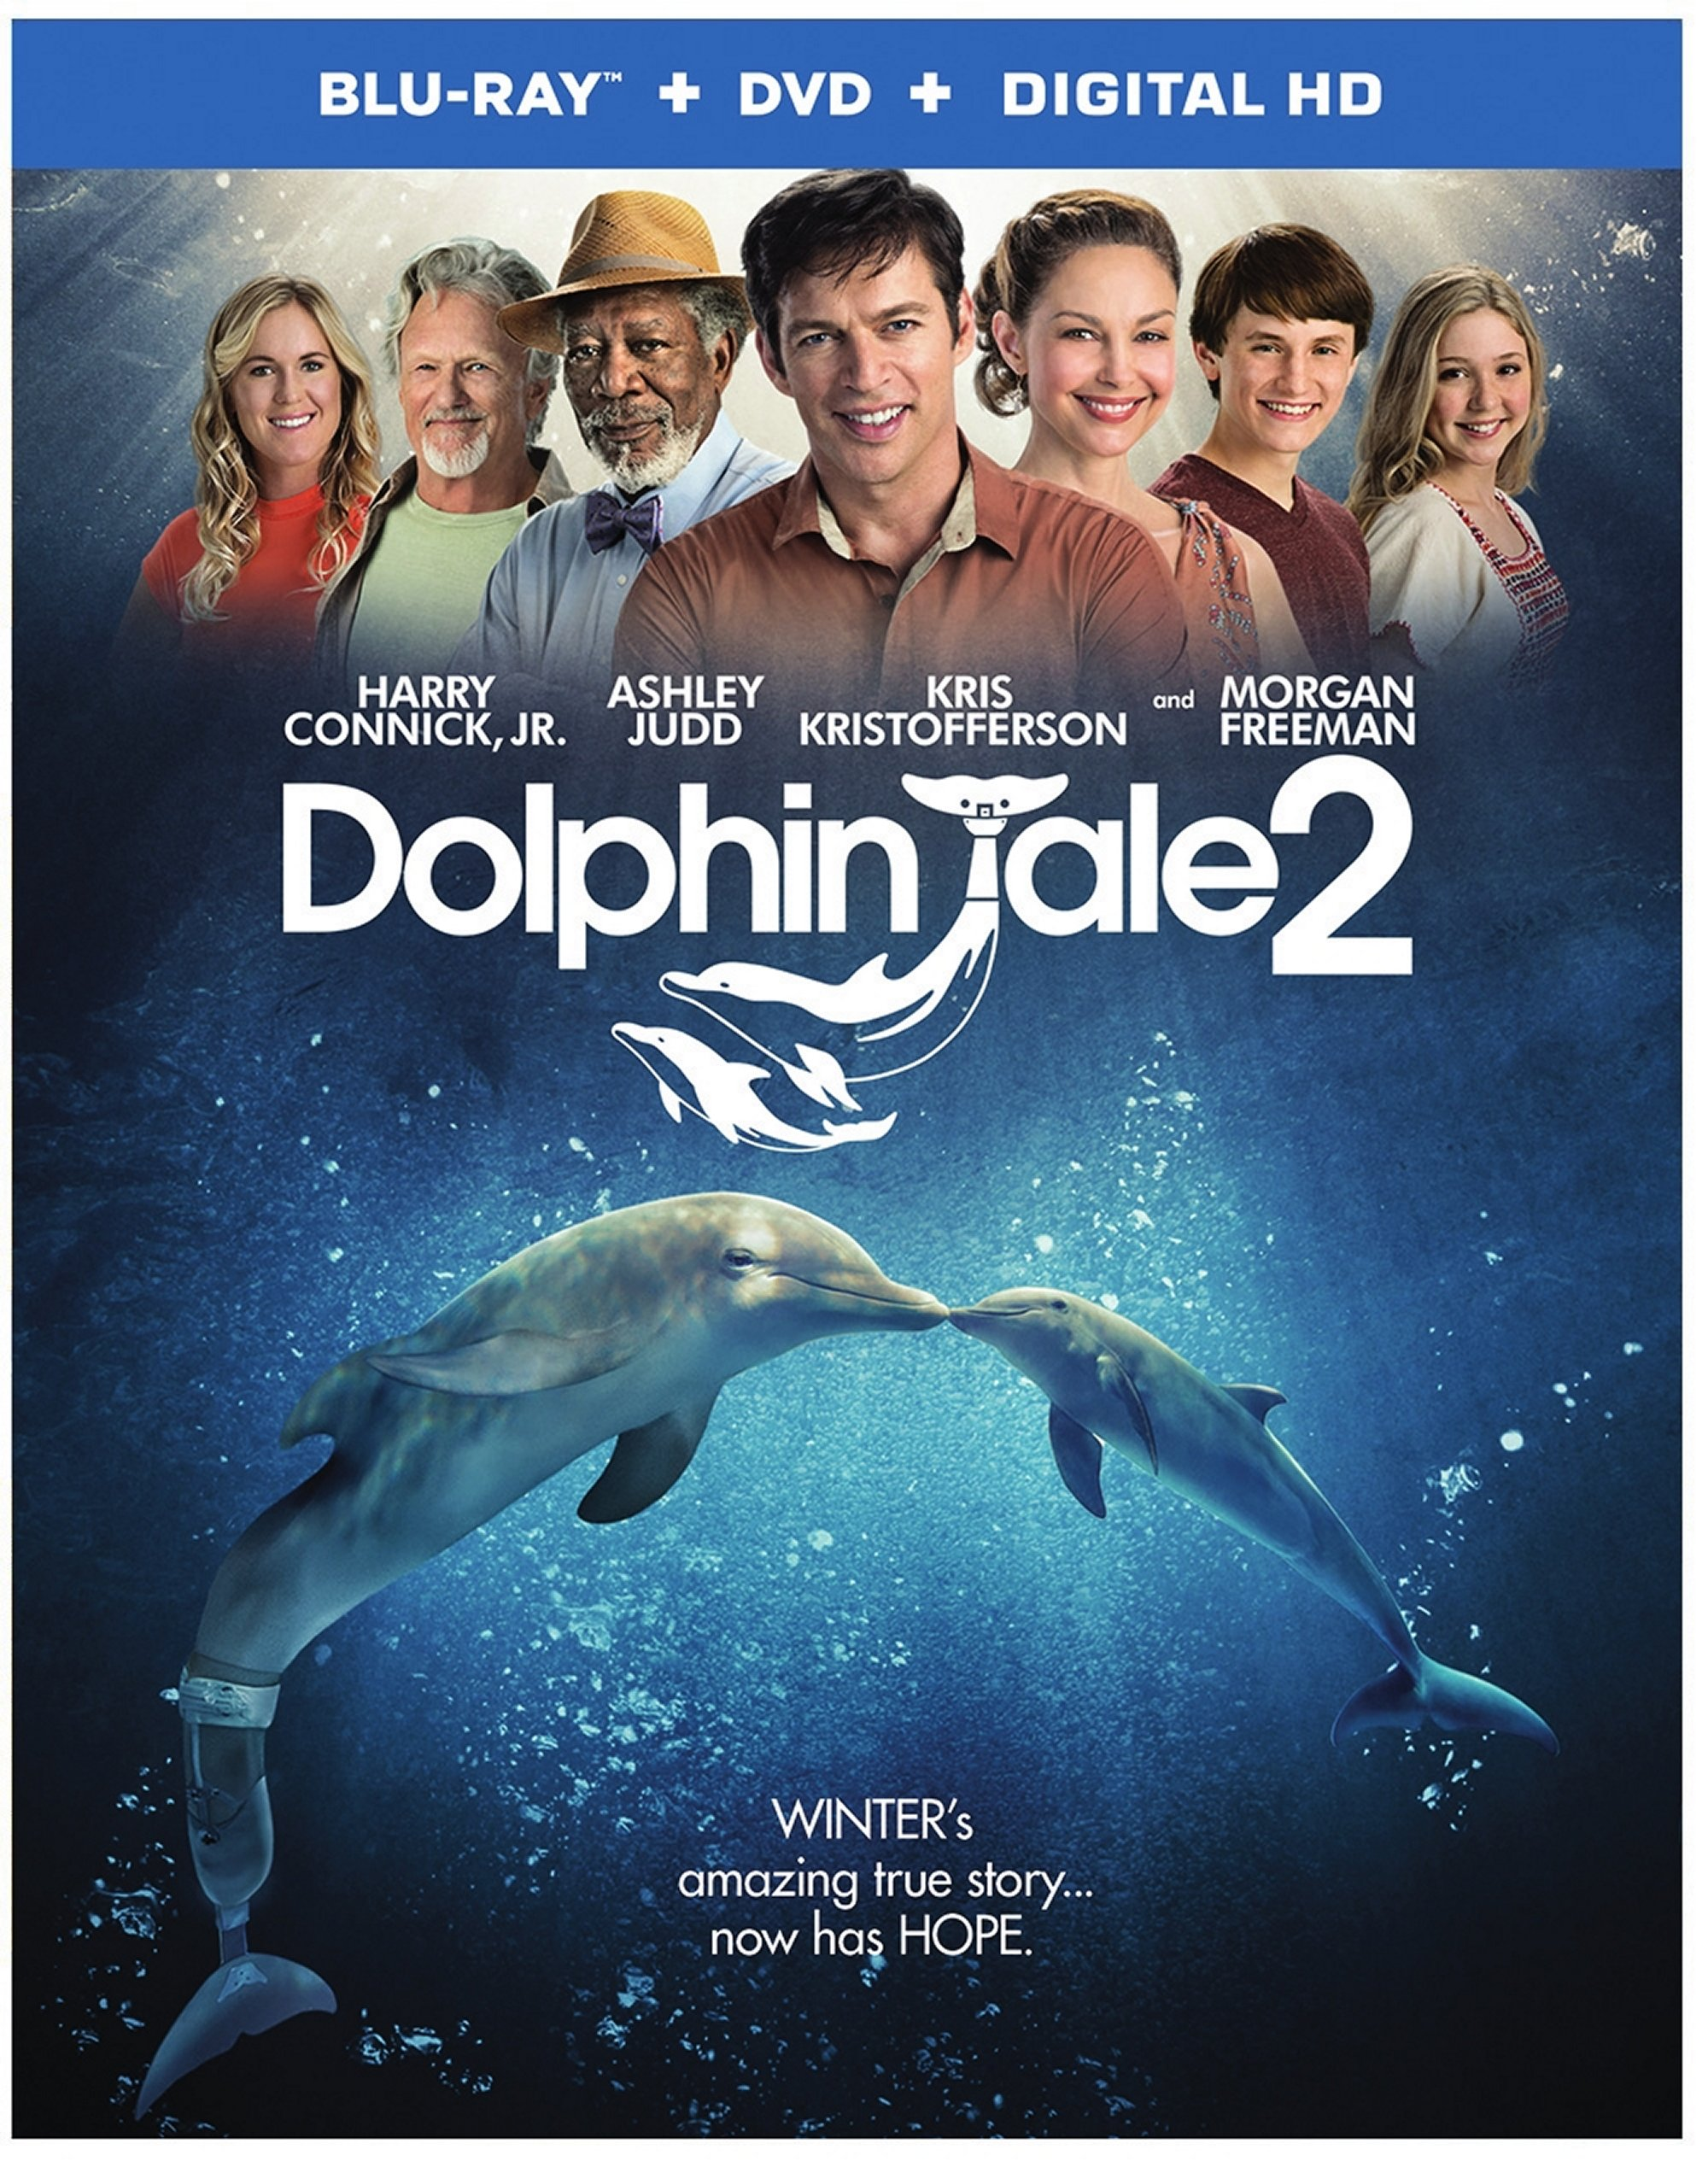 Dolphin Tale 2 Blu-ray